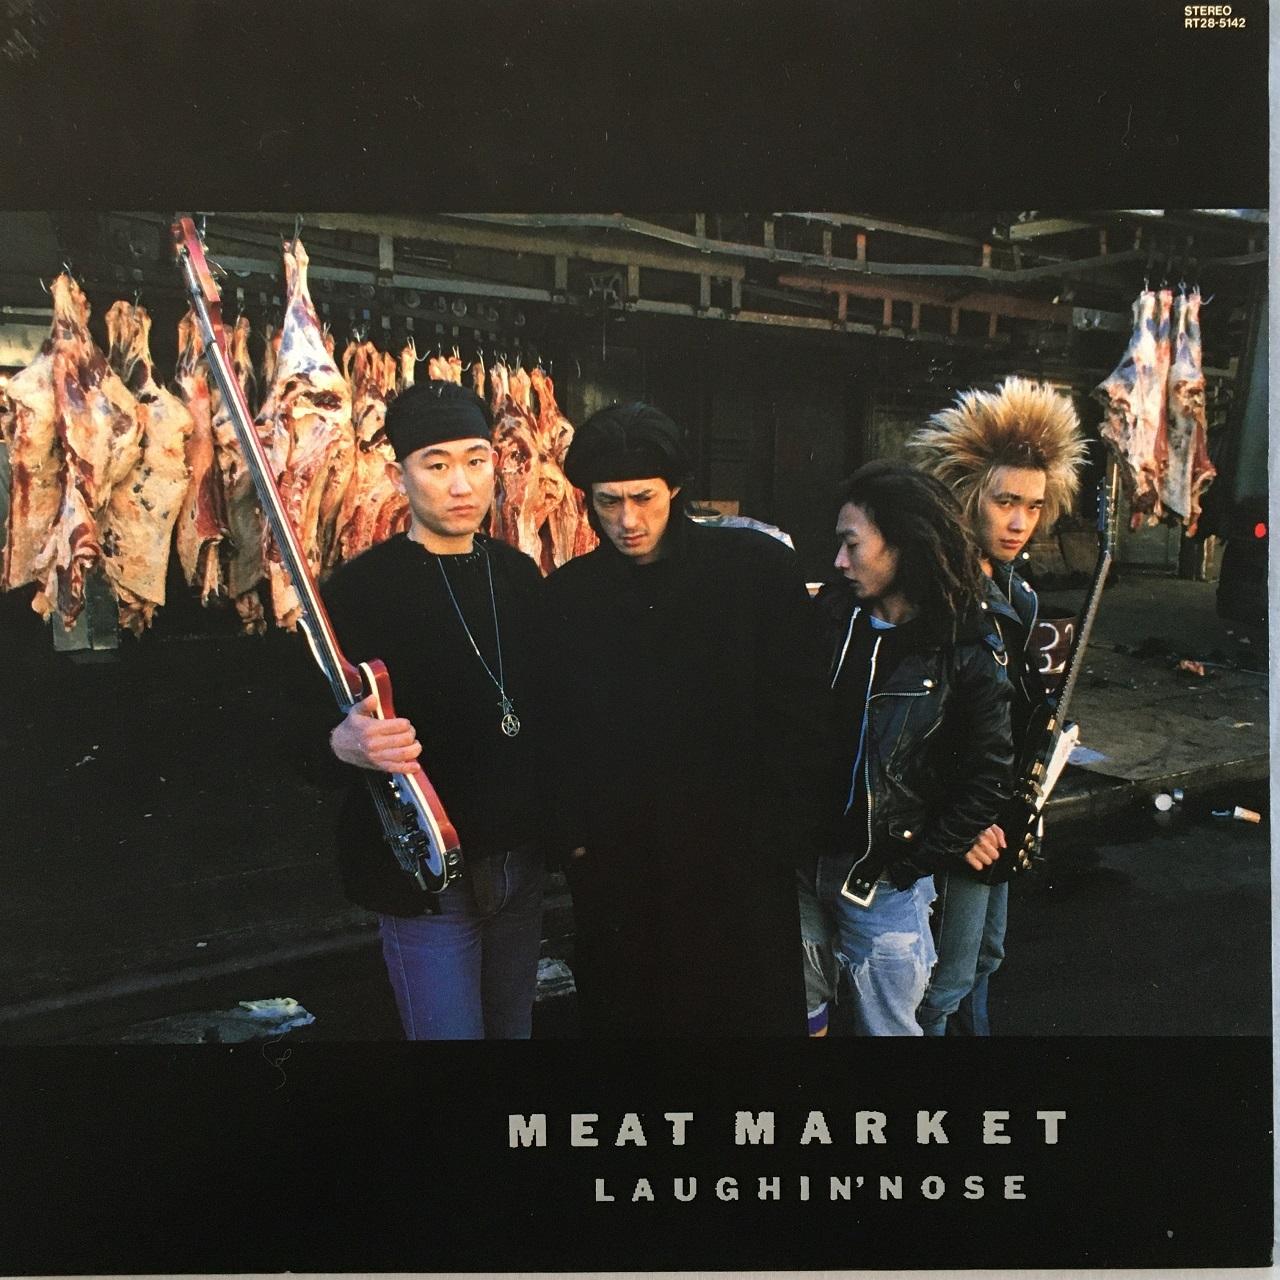 【LP・国内盤】ラフィン・ノーズ / Meat Market